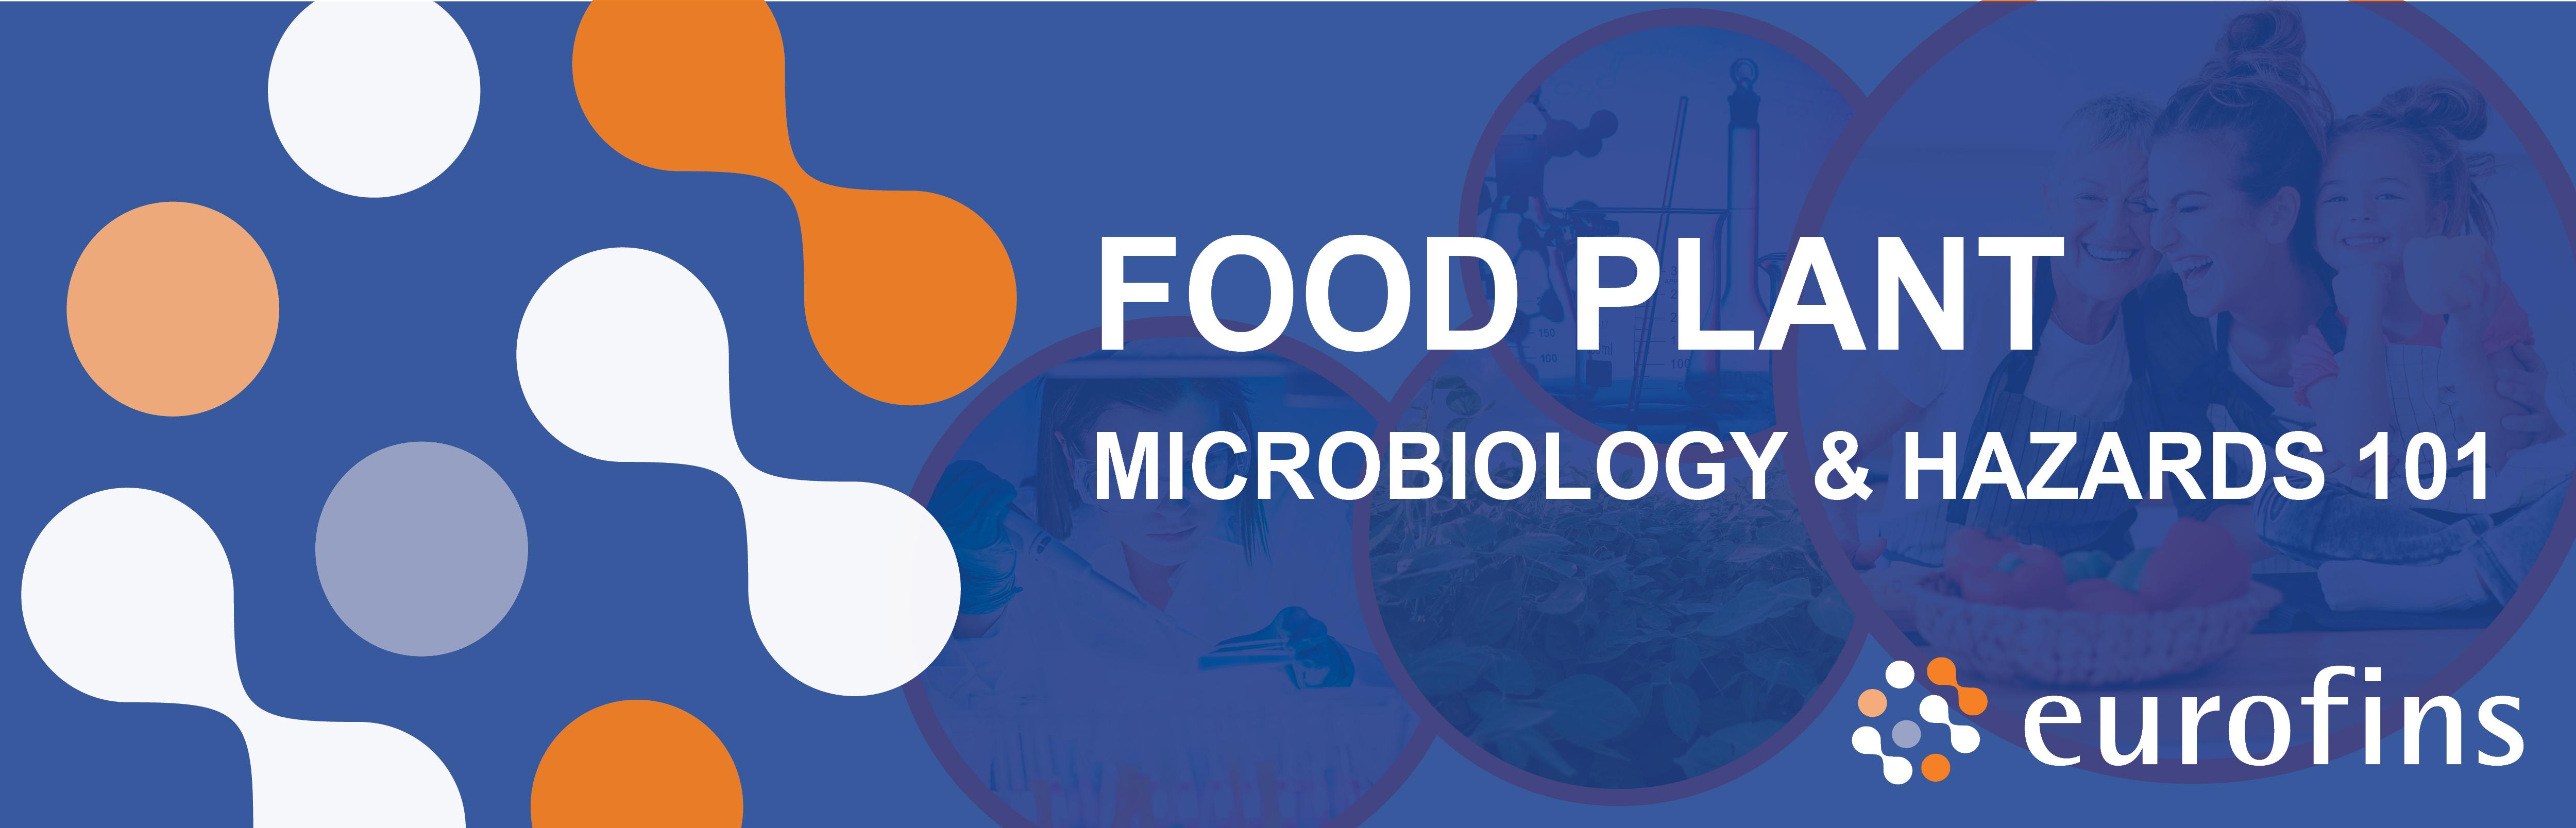 Food Plant Microbiology & Hazards 101